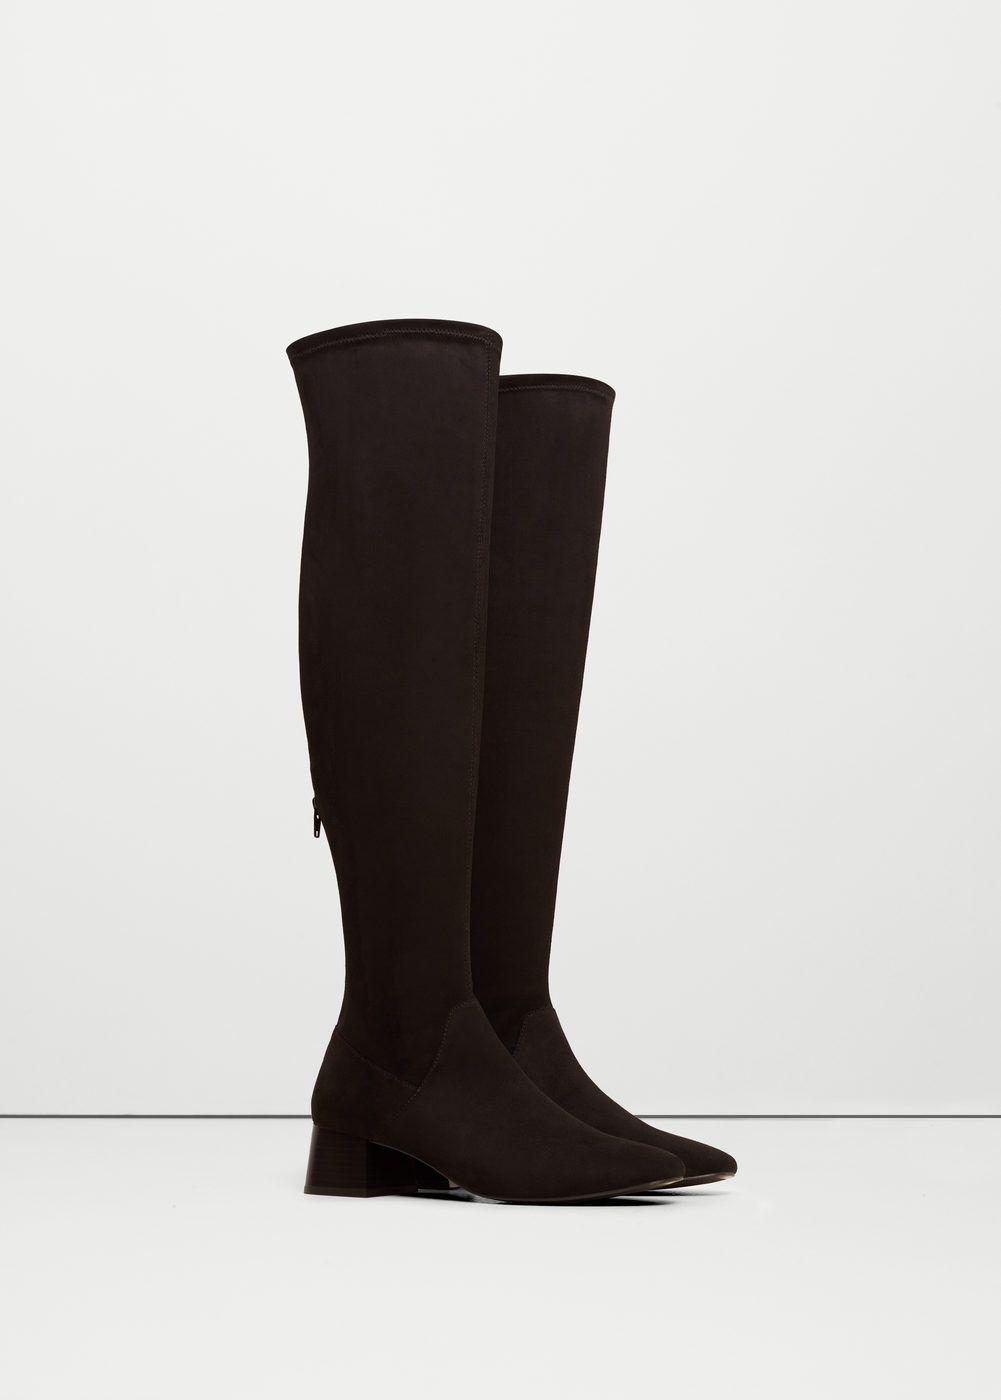 71b71a9e1bbb2c Overkneestiefel mit absatz - Schuhe für Damen